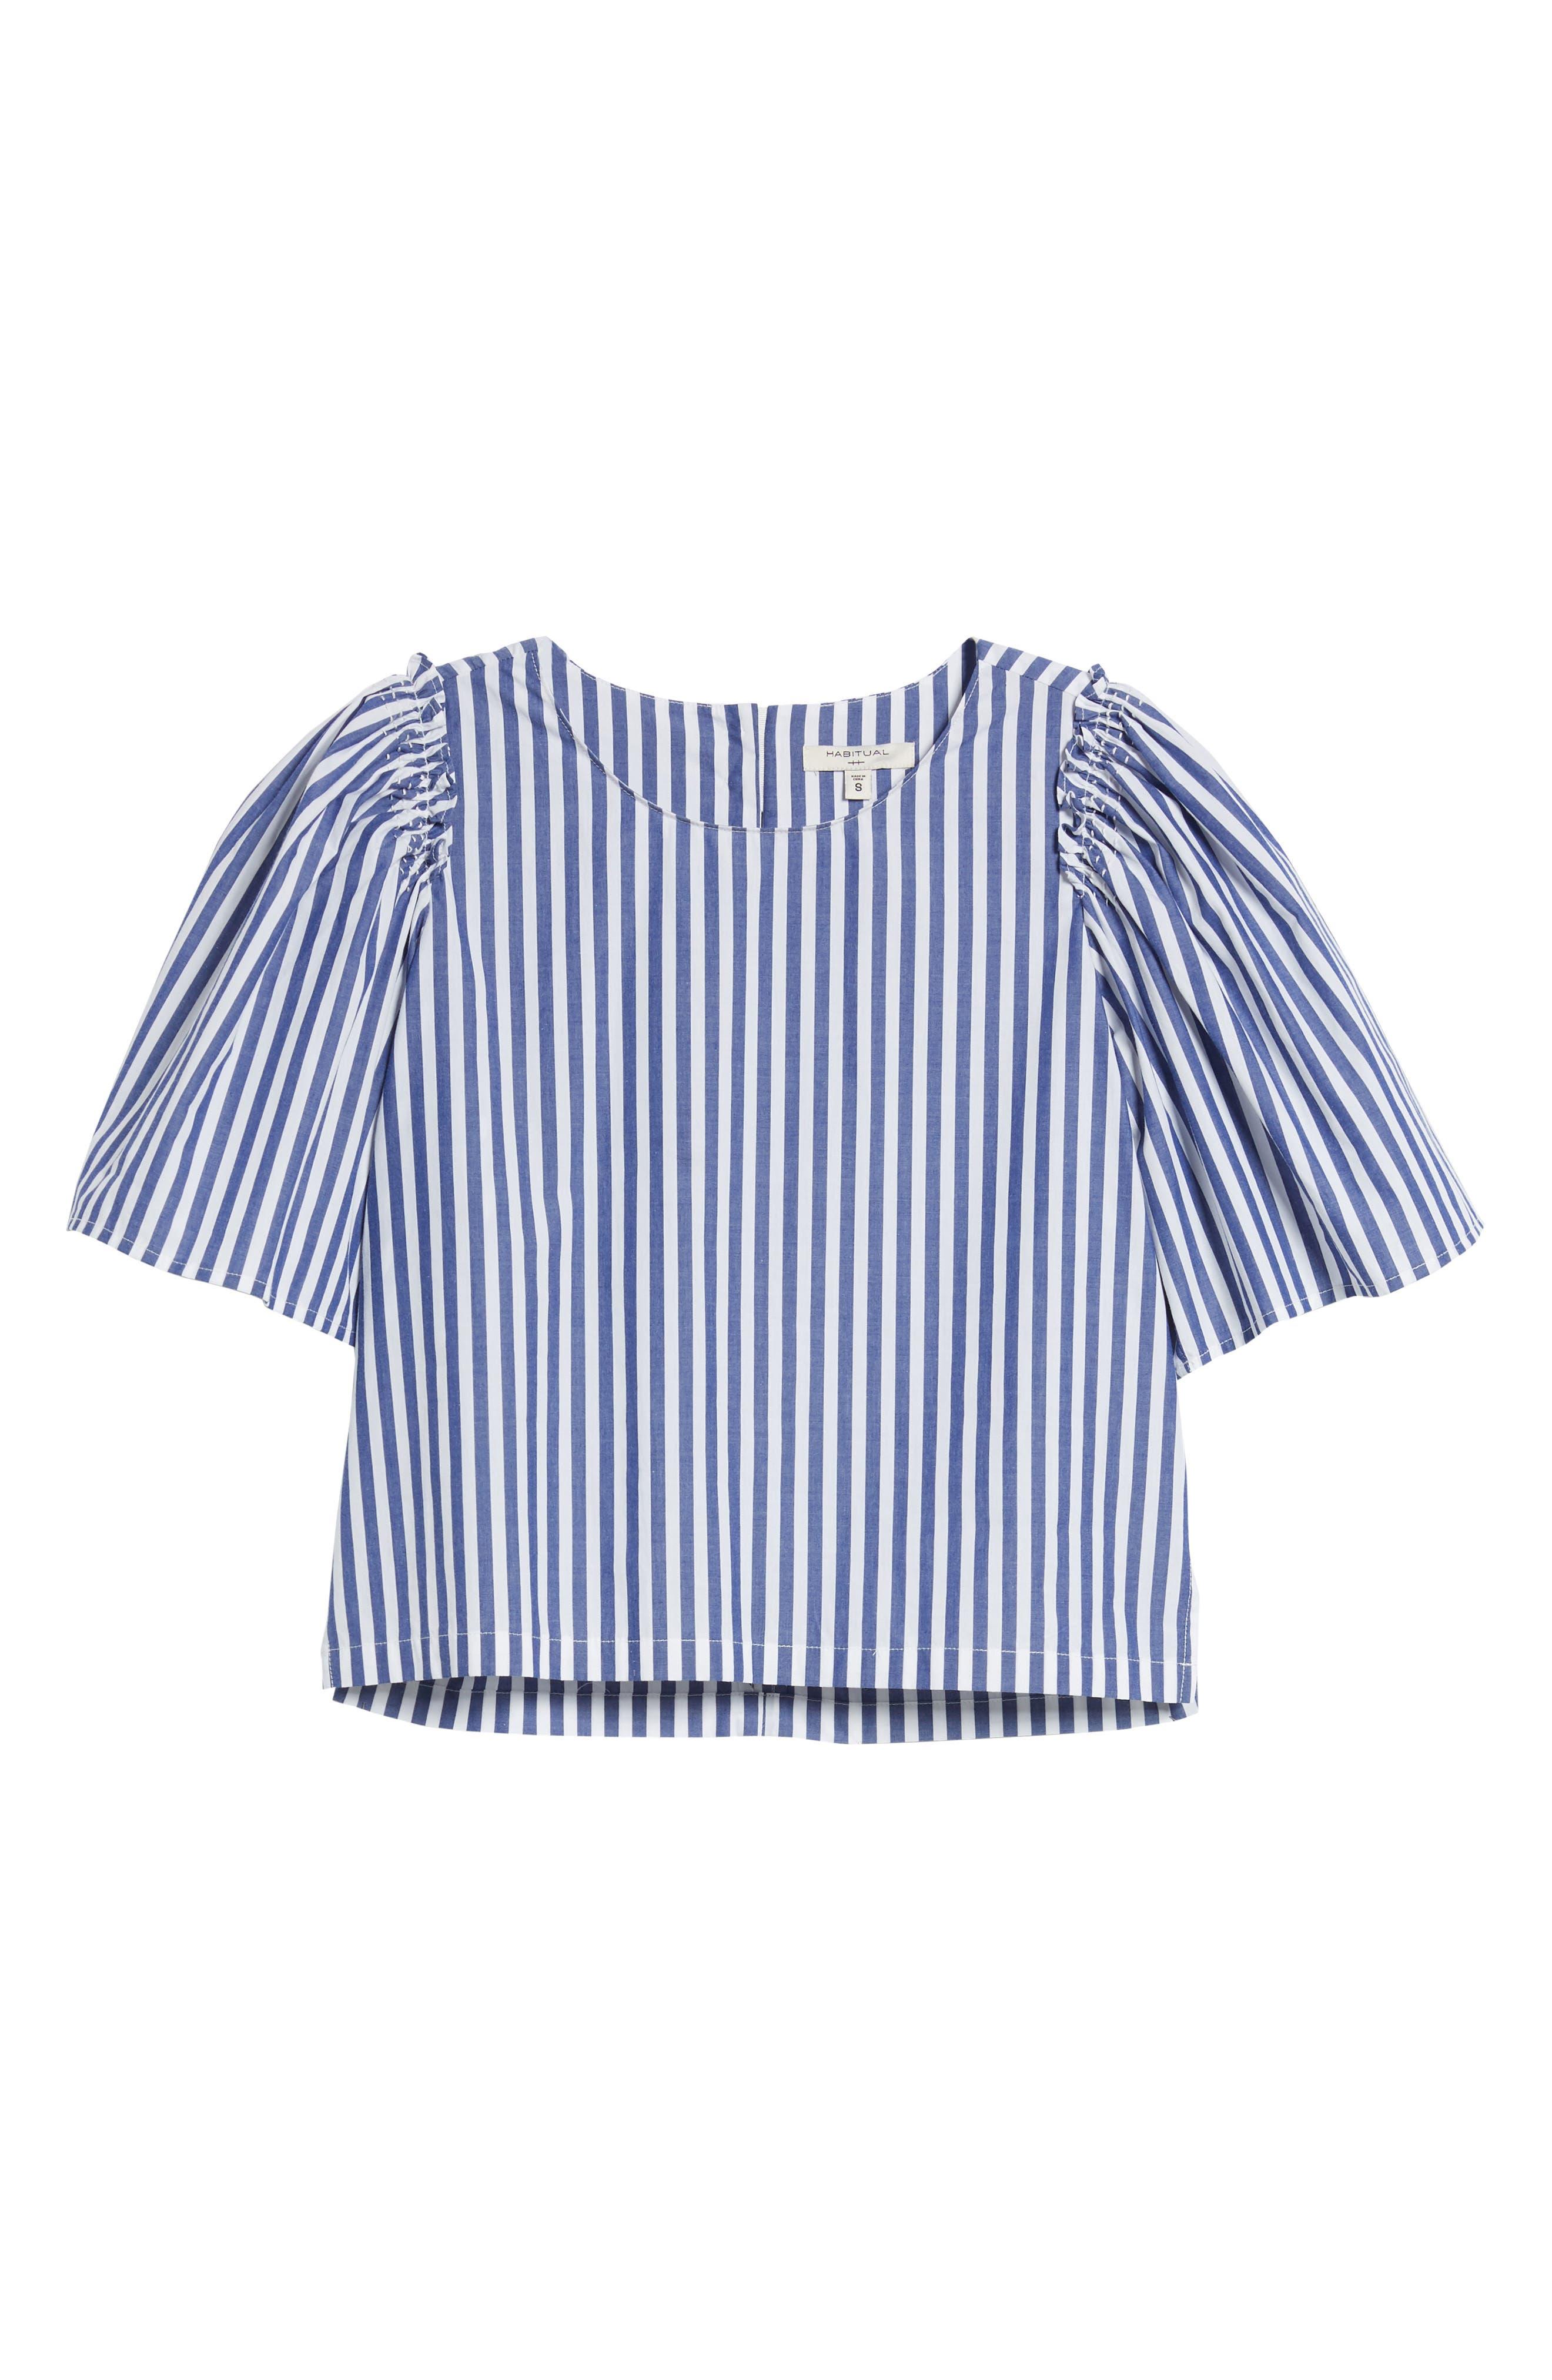 Valeria Stripe Stretch Cotton Top,                             Alternate thumbnail 7, color,                             Blue/ White